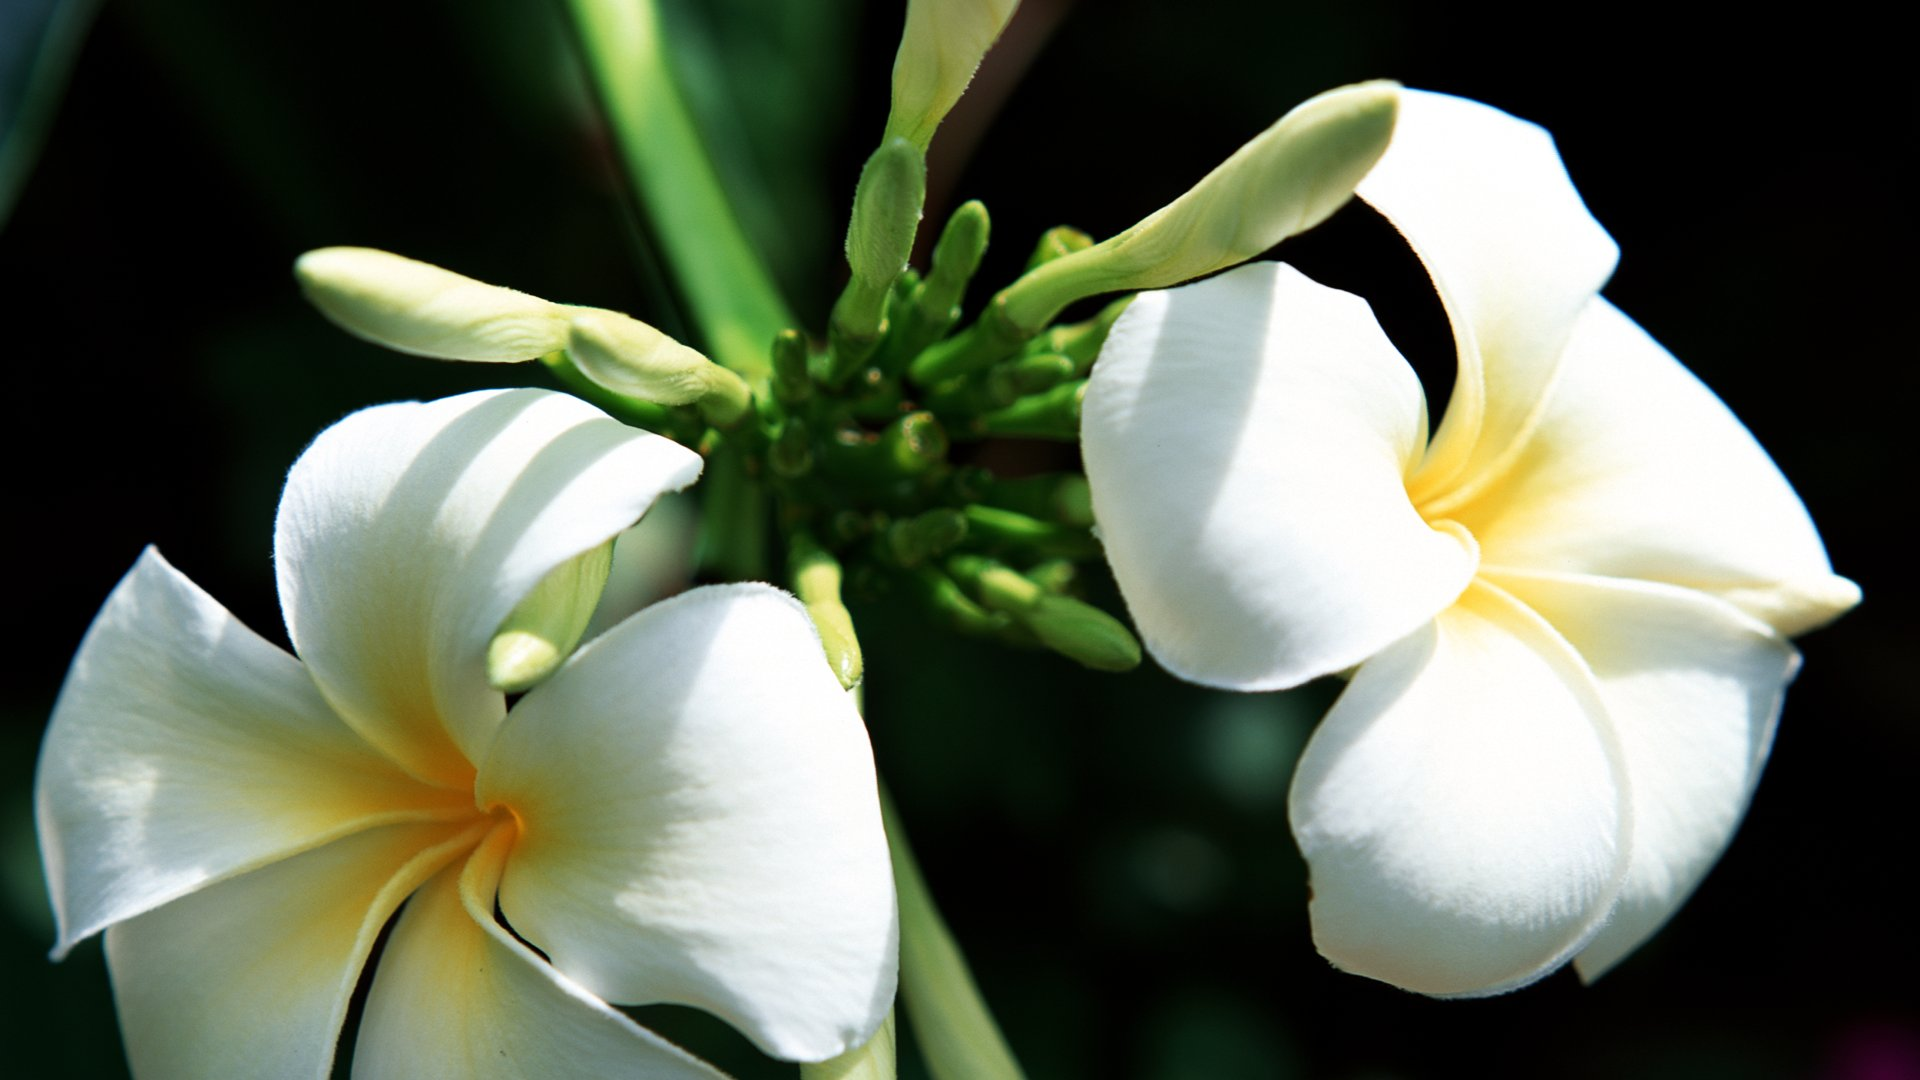 Flowers Images Stock Photos amp Vectors  Shutterstock